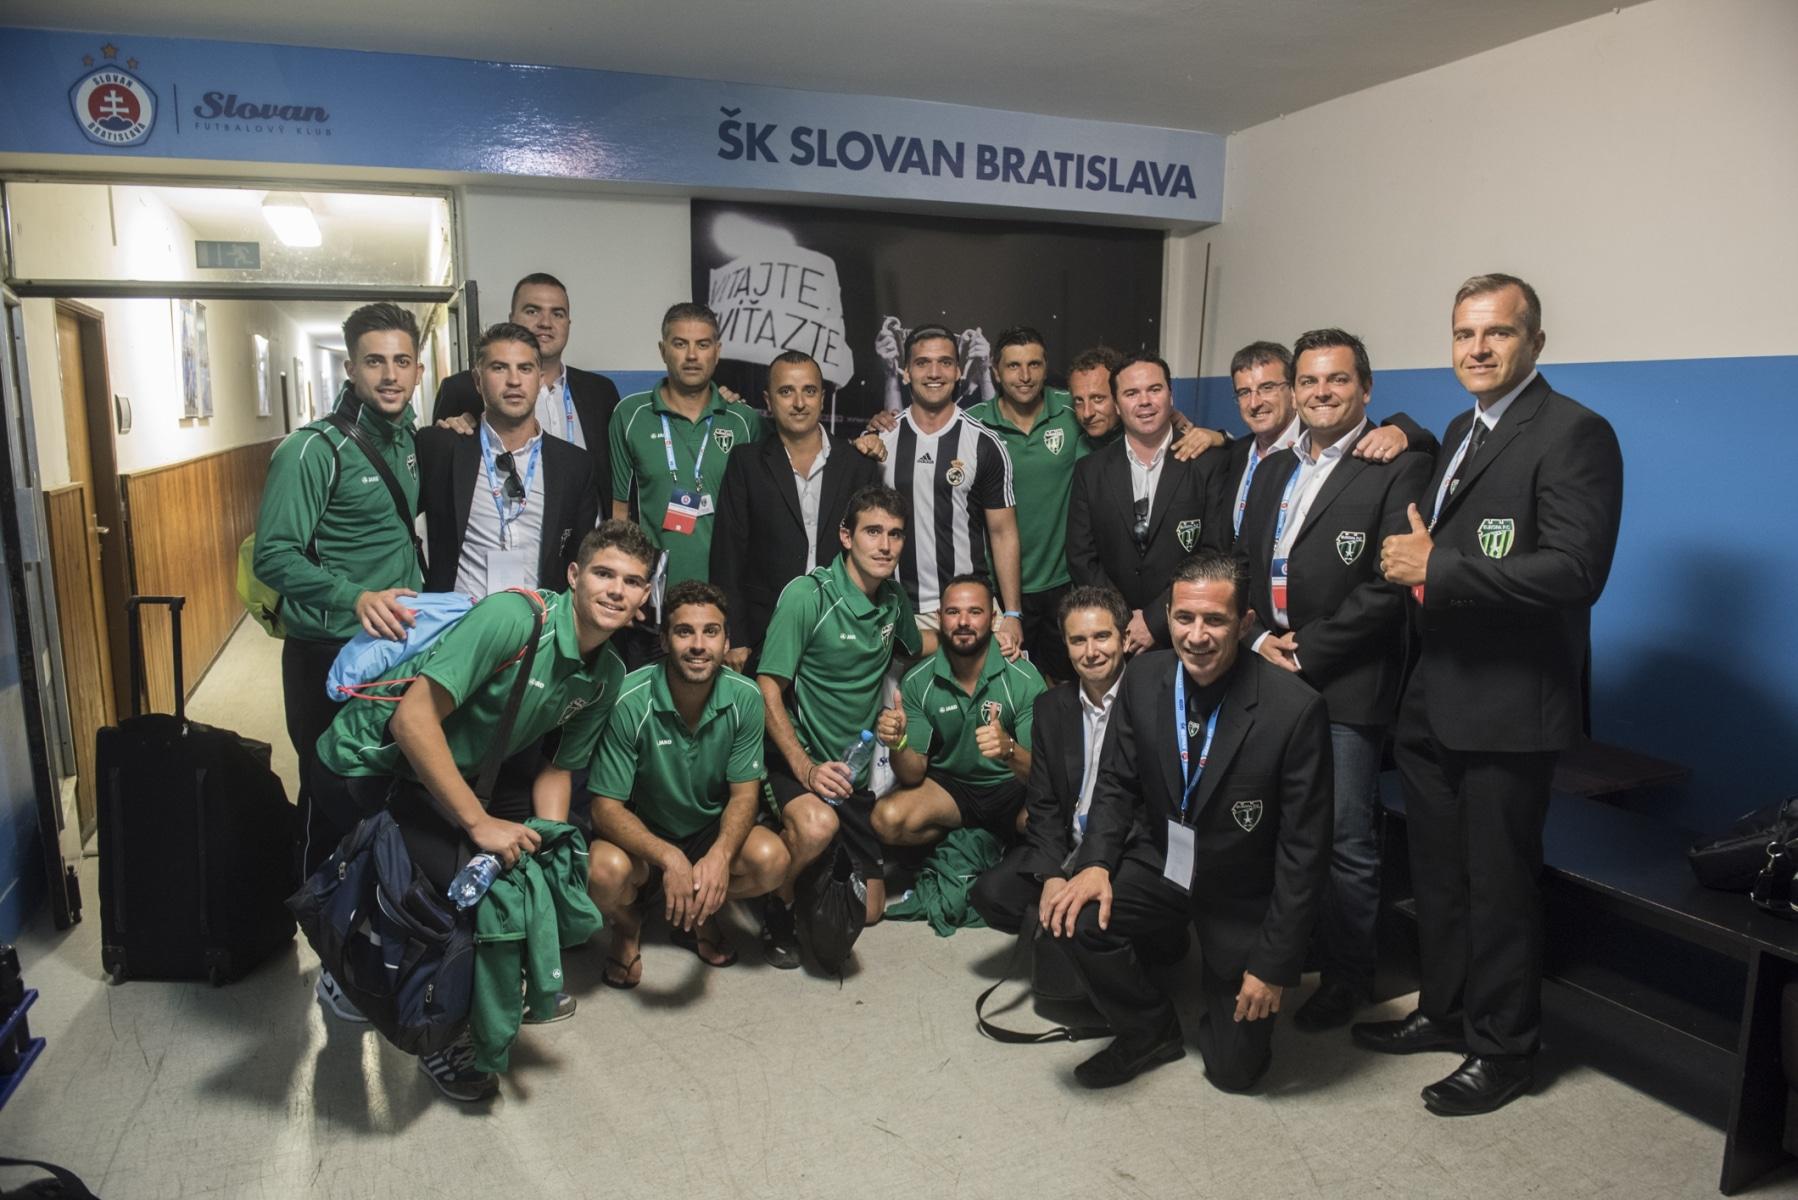 sk-slovan-bratislava-europa-fc-gibraltar-09072015-15_19570563535_o